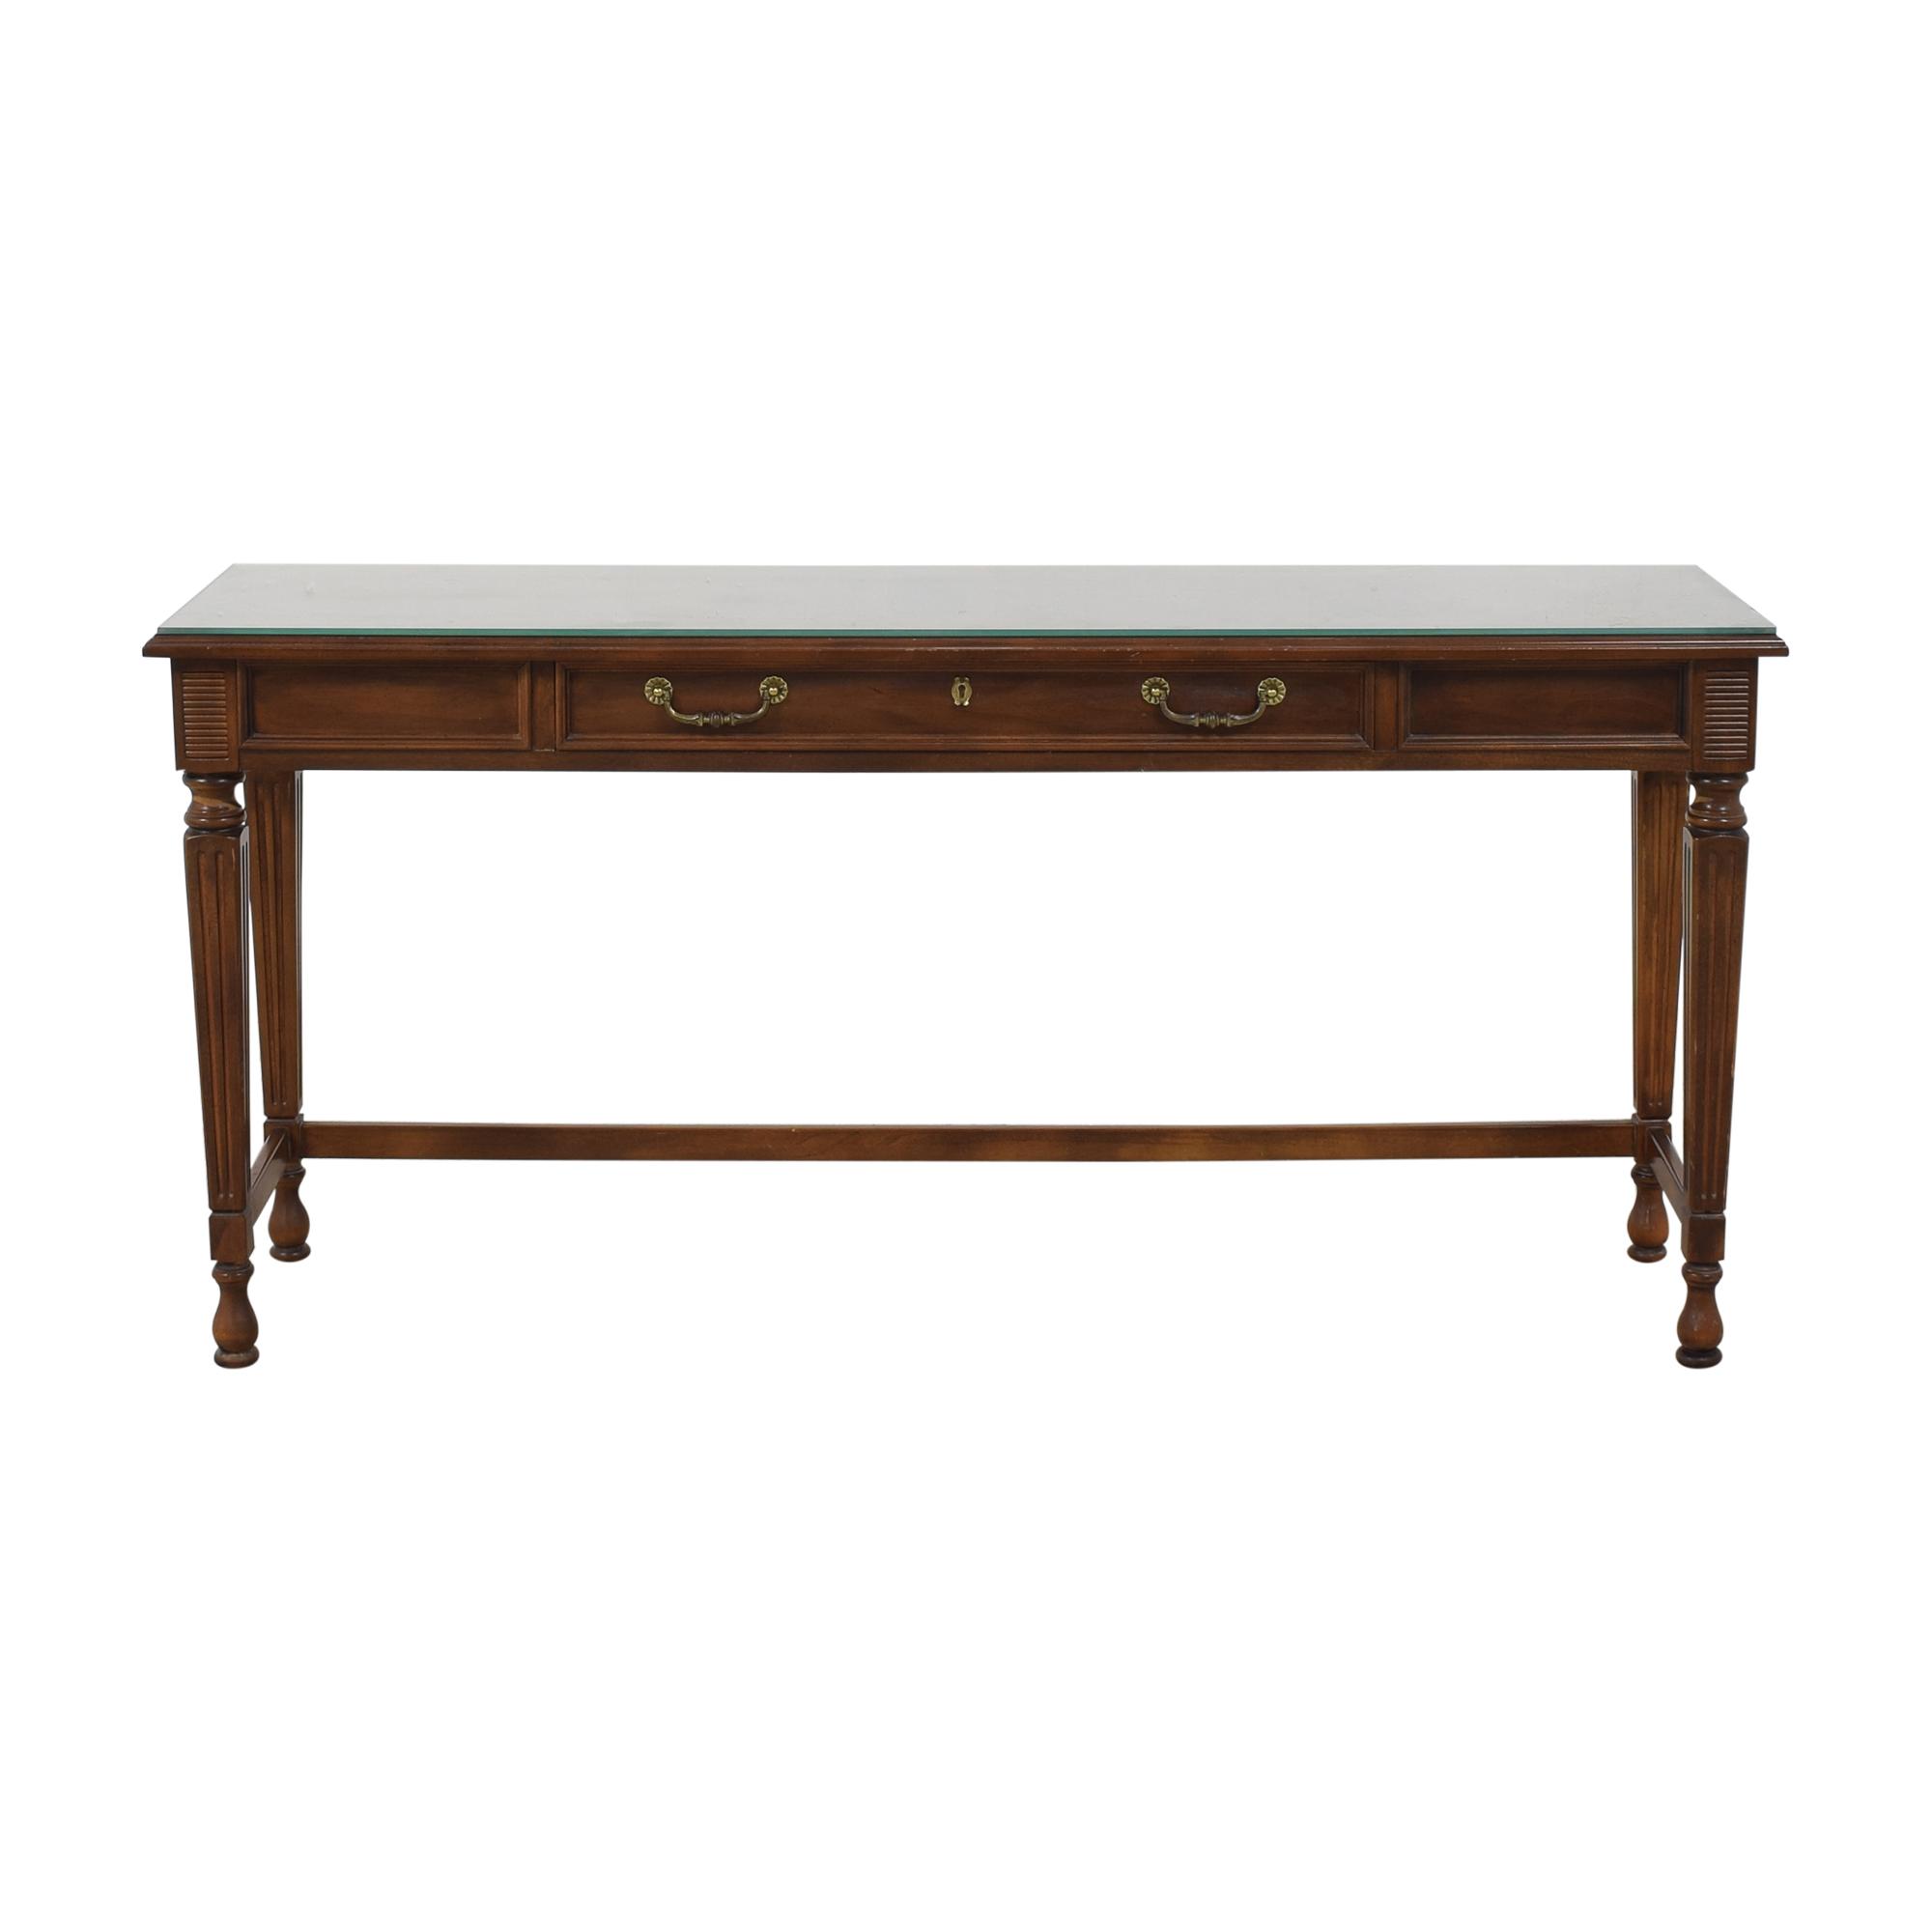 Drexel Sofa Table sale